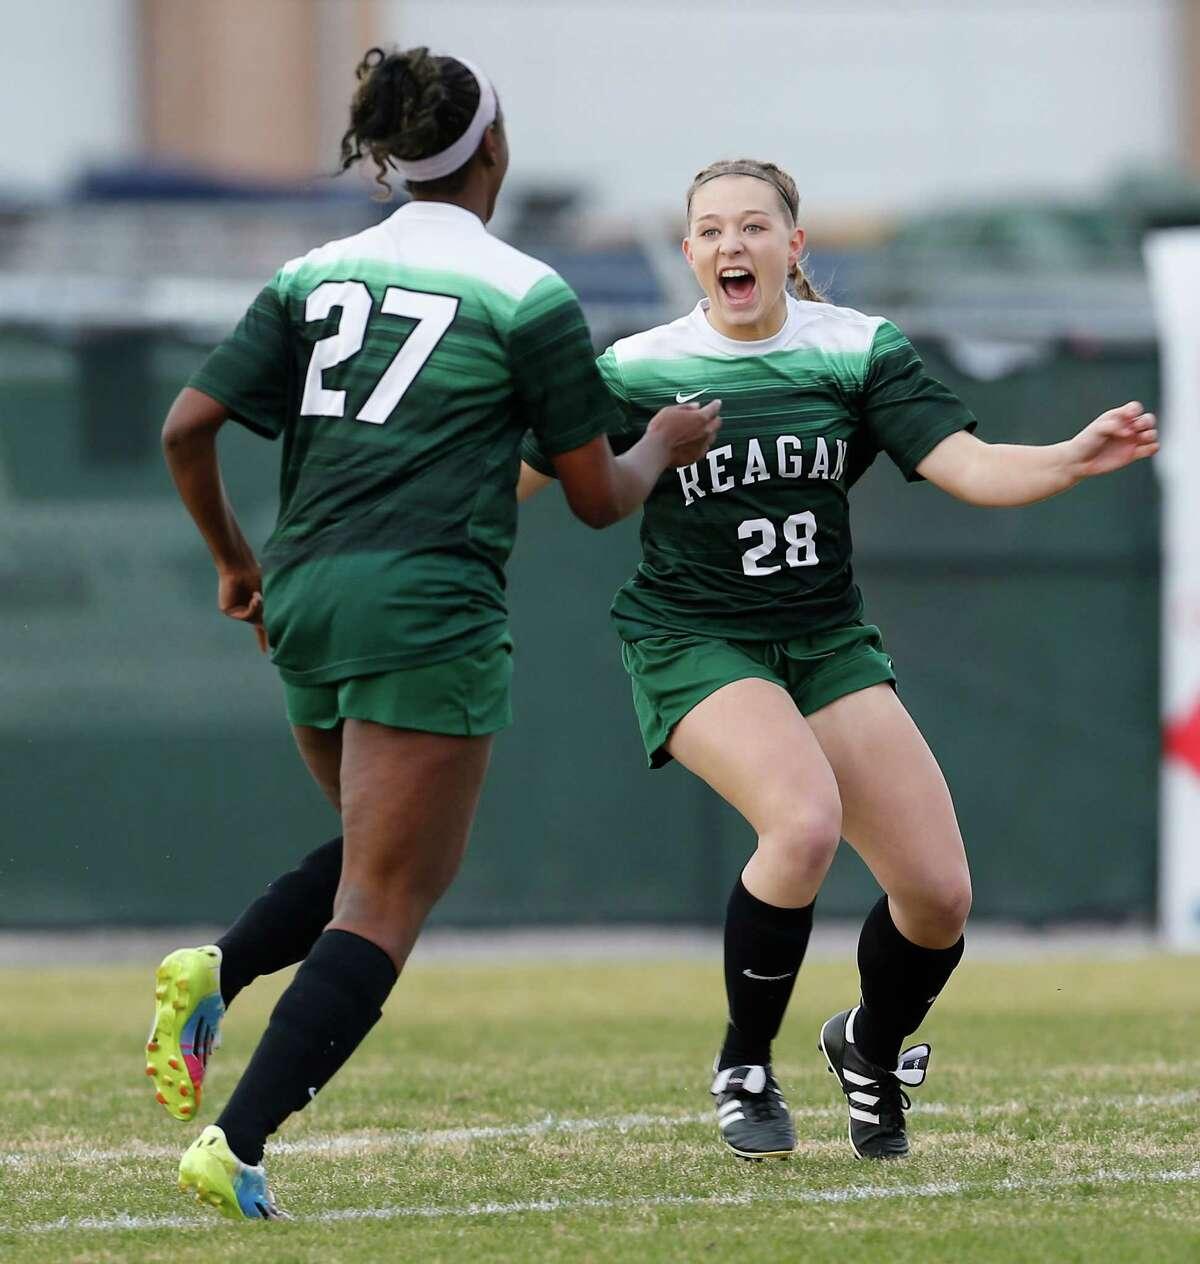 Reagan's Taylor Olson (28) reacts after scoring an early goal against Johnson in girls soccer at Blossom Soccer Stadium on Friday, Feb. 5, 2016. Johnson defeated Reagan, 2-1. (Kin Man Hui/San Antonio Express-News)